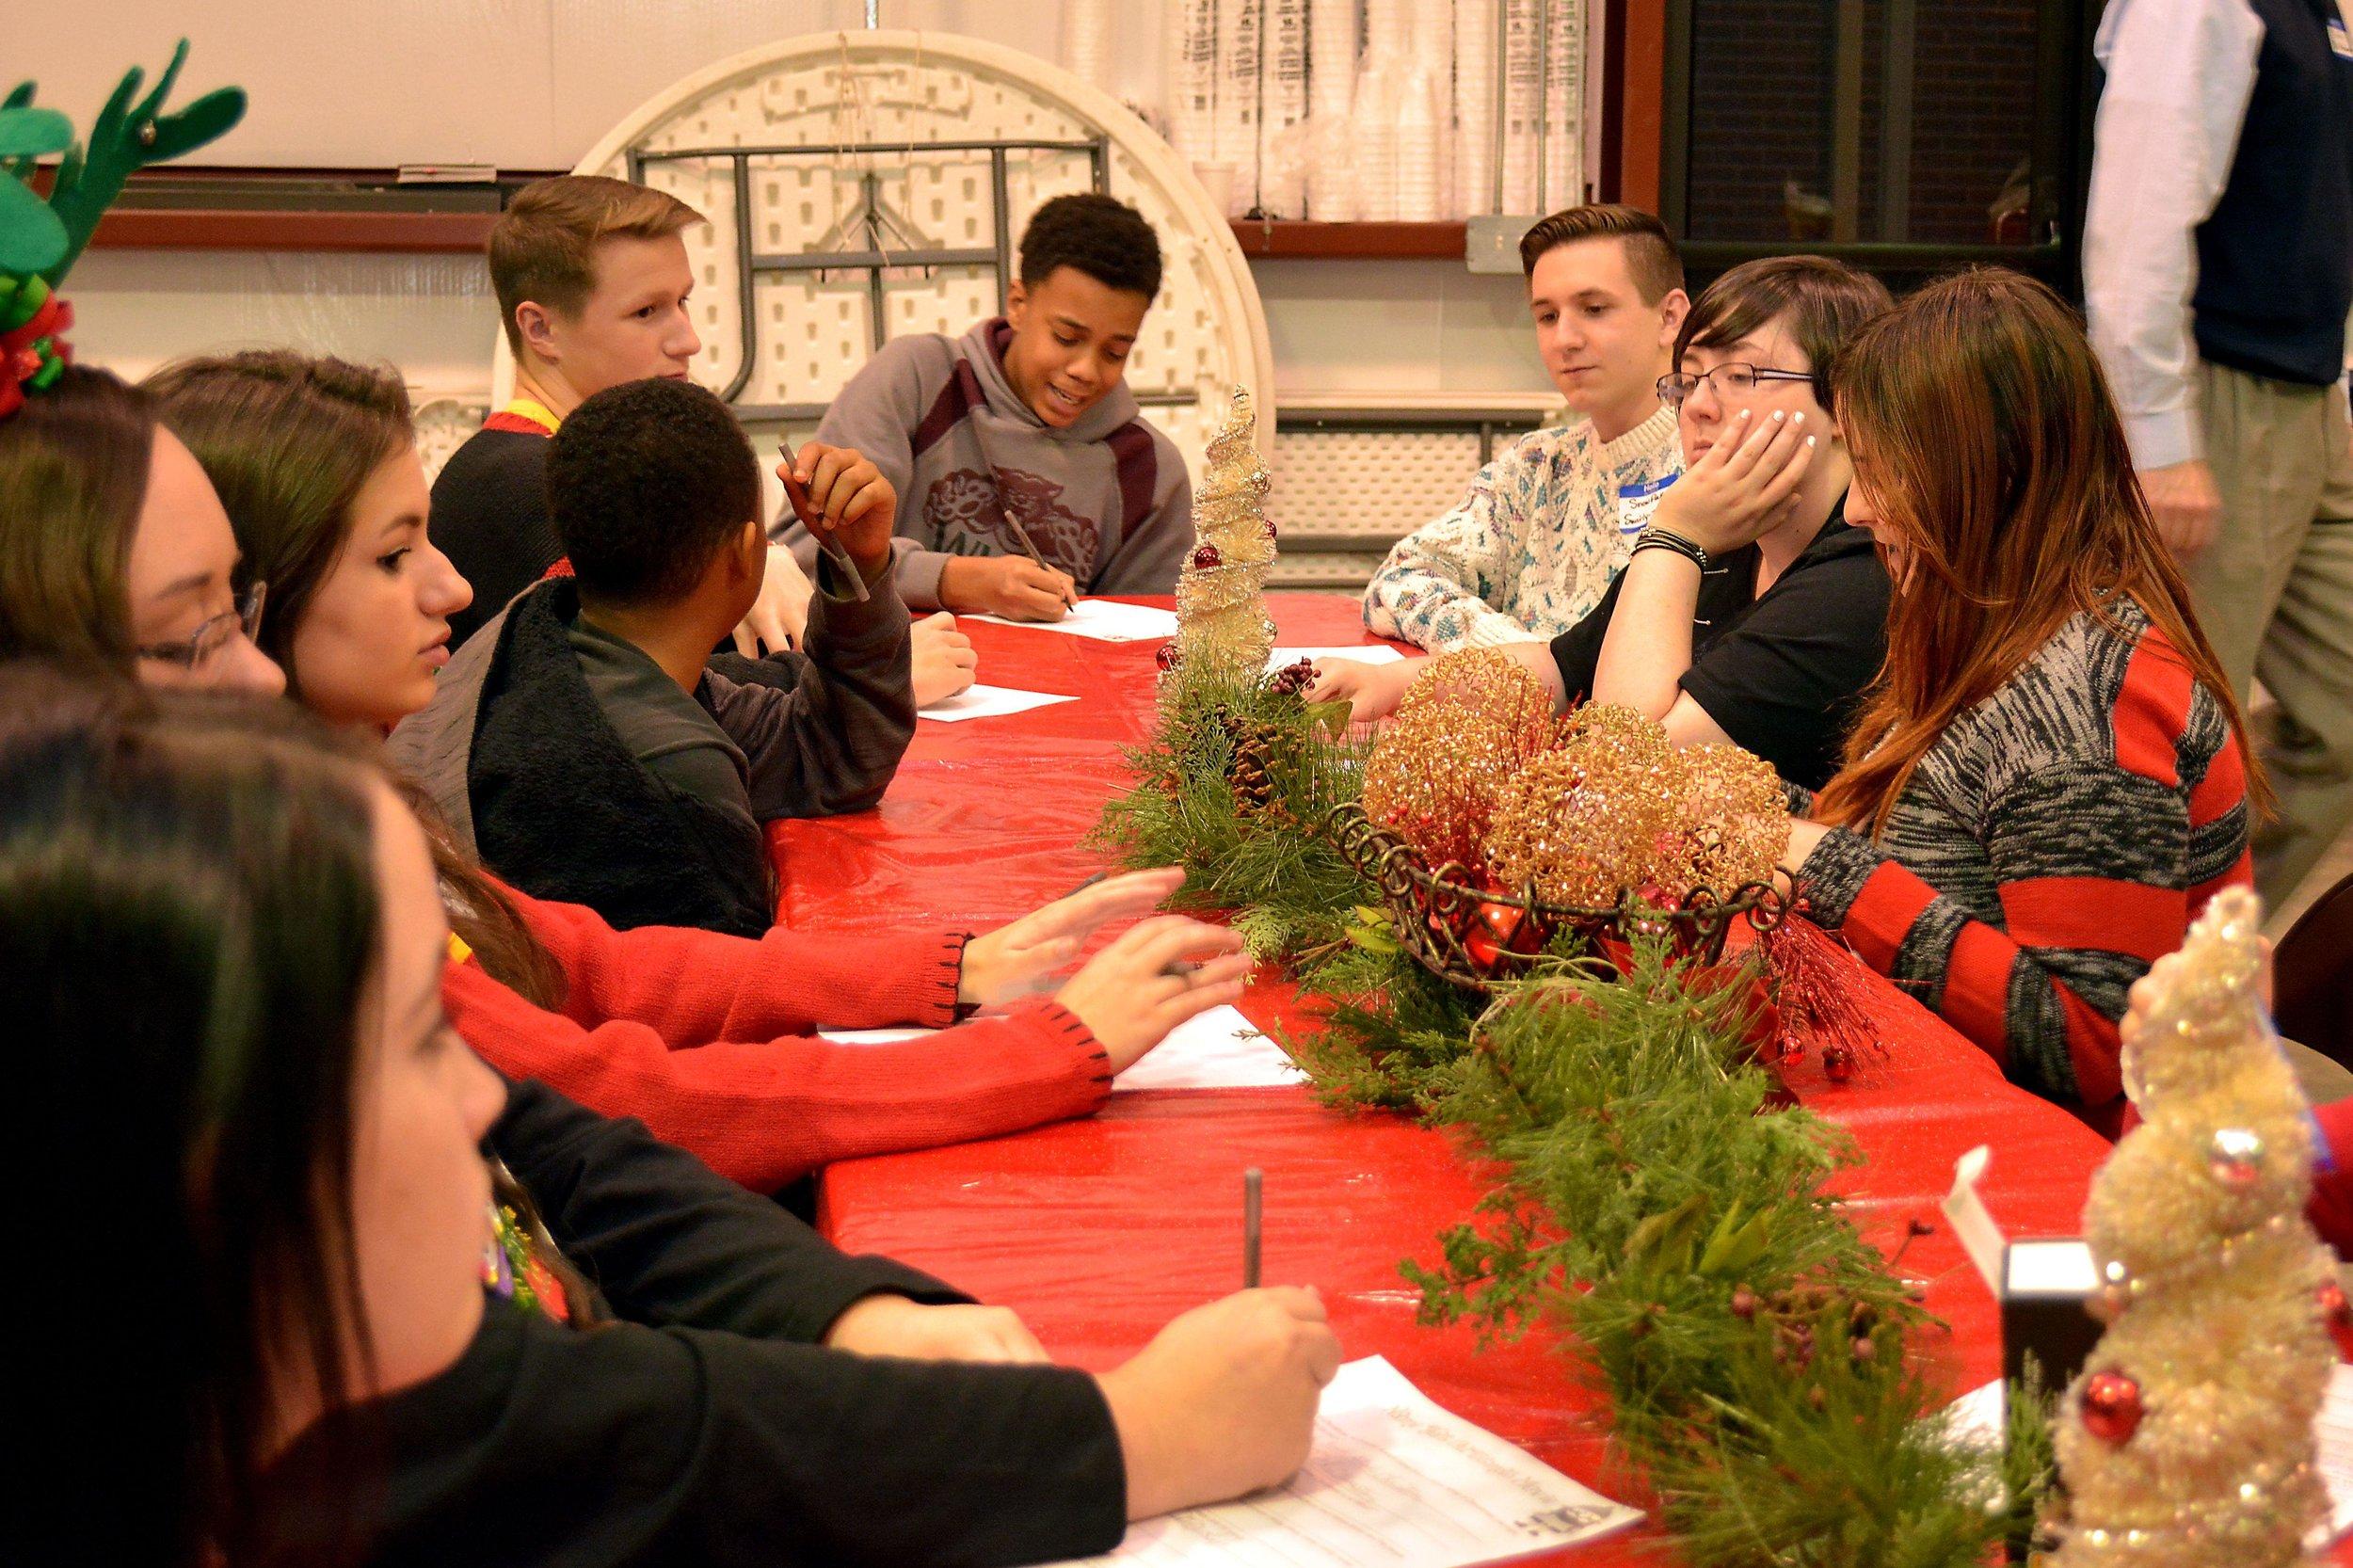 [tbclenoir.net]_1241_senior saint, teen christmas, our christmas 2015 035.jpeg